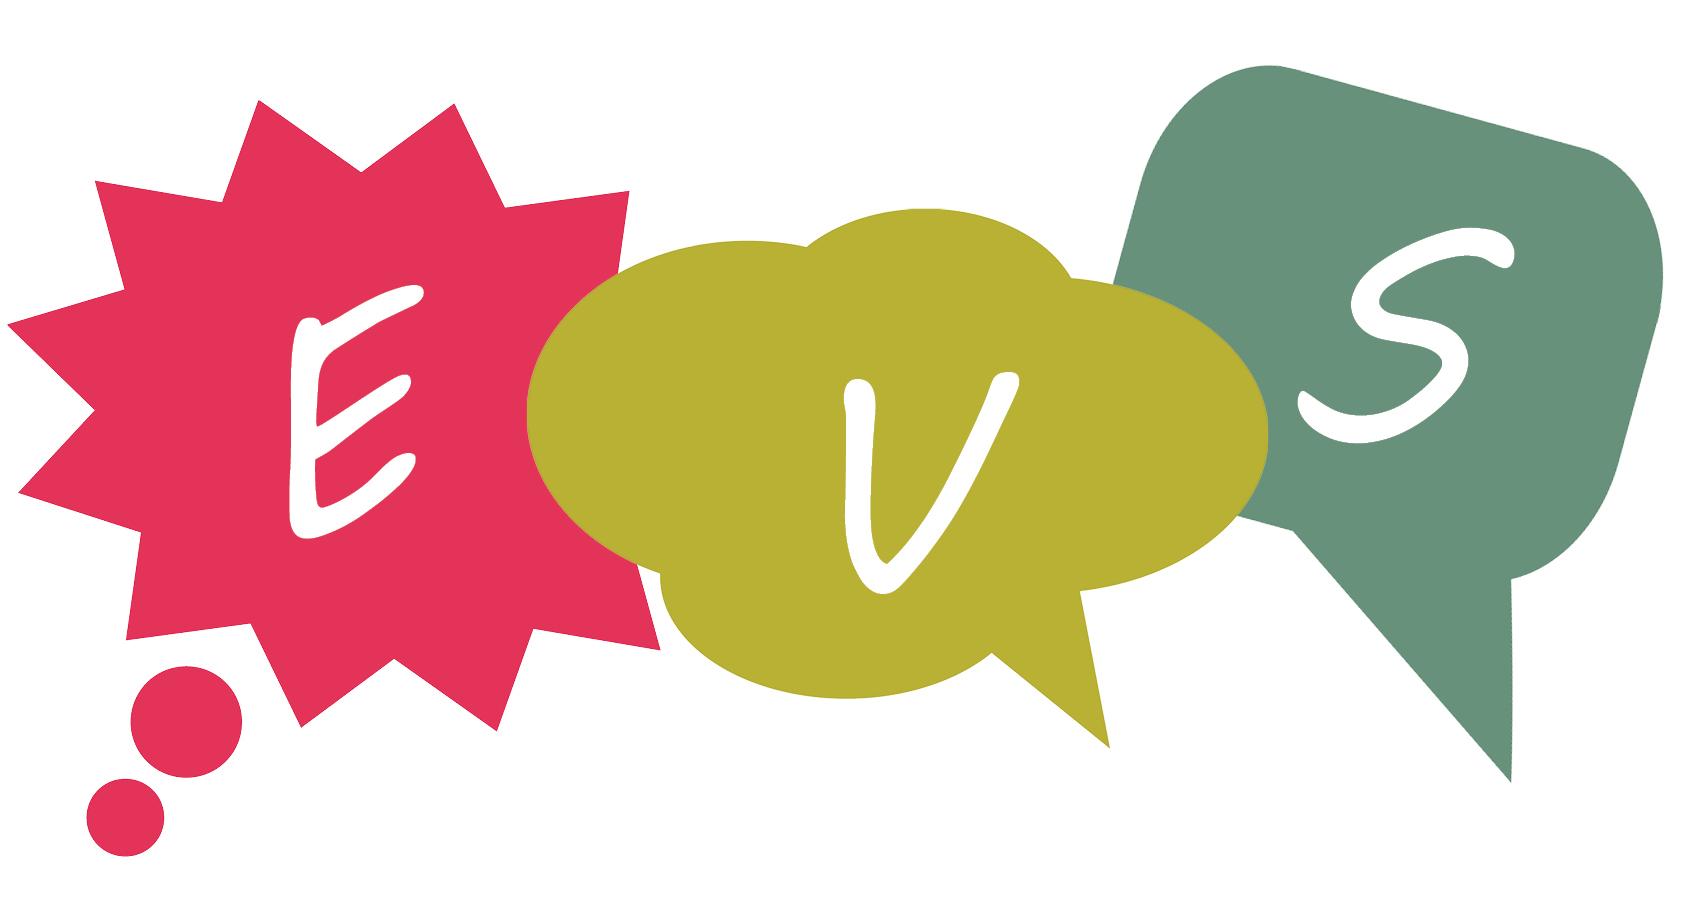 Programme des activités de l'EVS septembre/octobre 2020